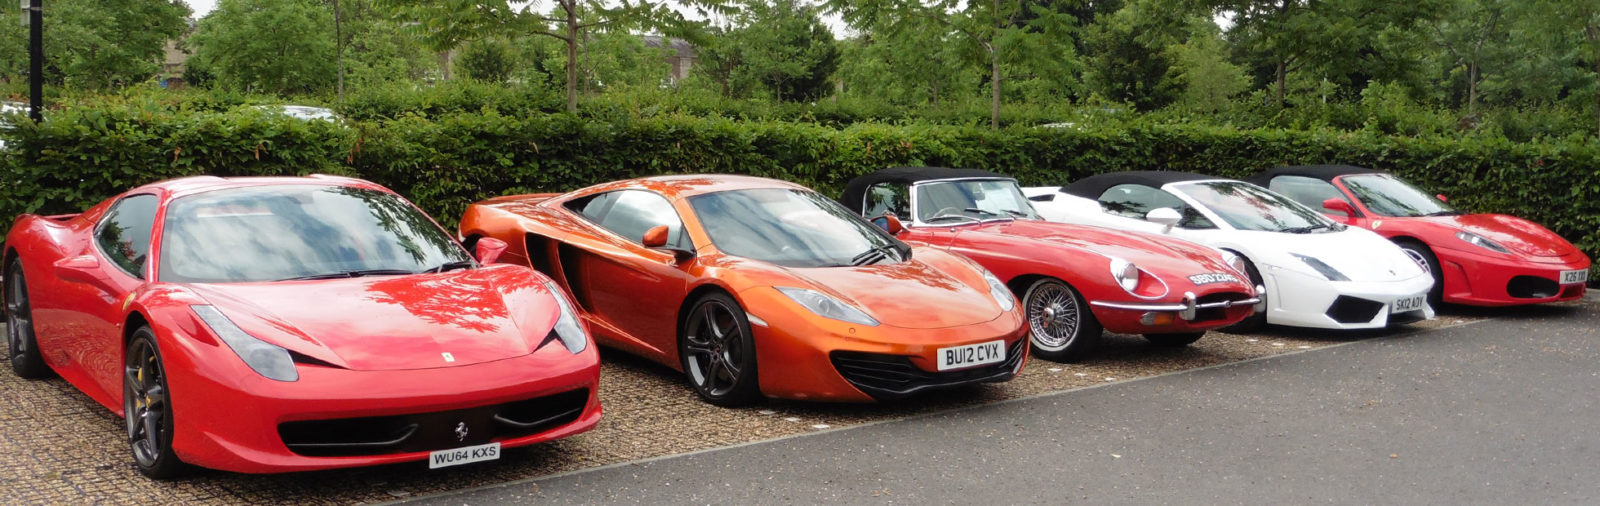 Classic Sports Car Hire Bristol